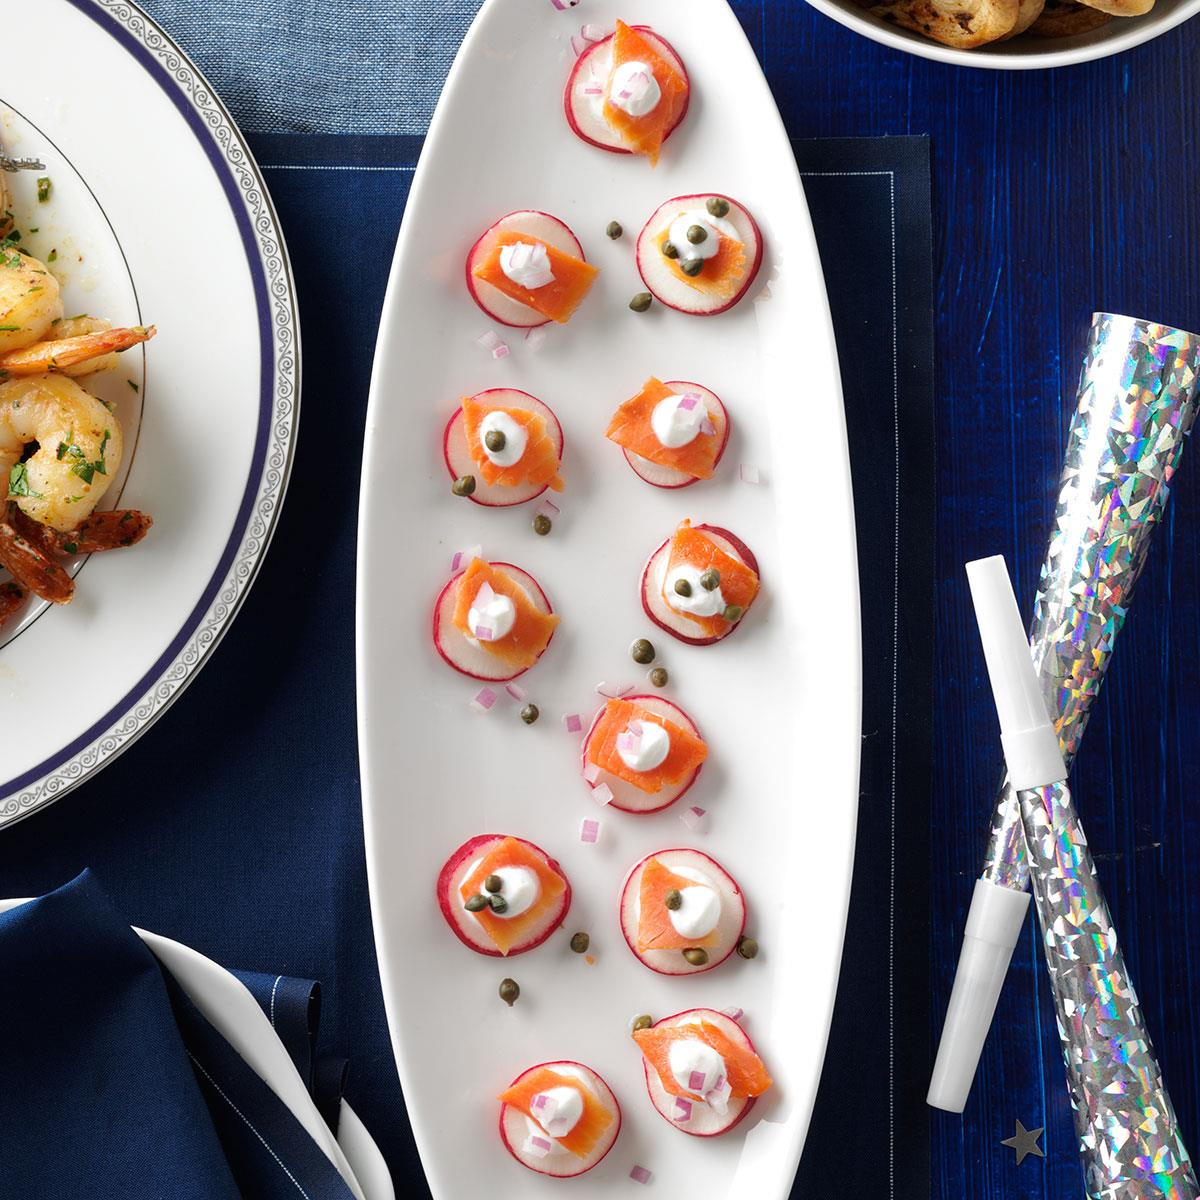 Smoked Salmon Bites Recipe How To Make It Taste Of Home